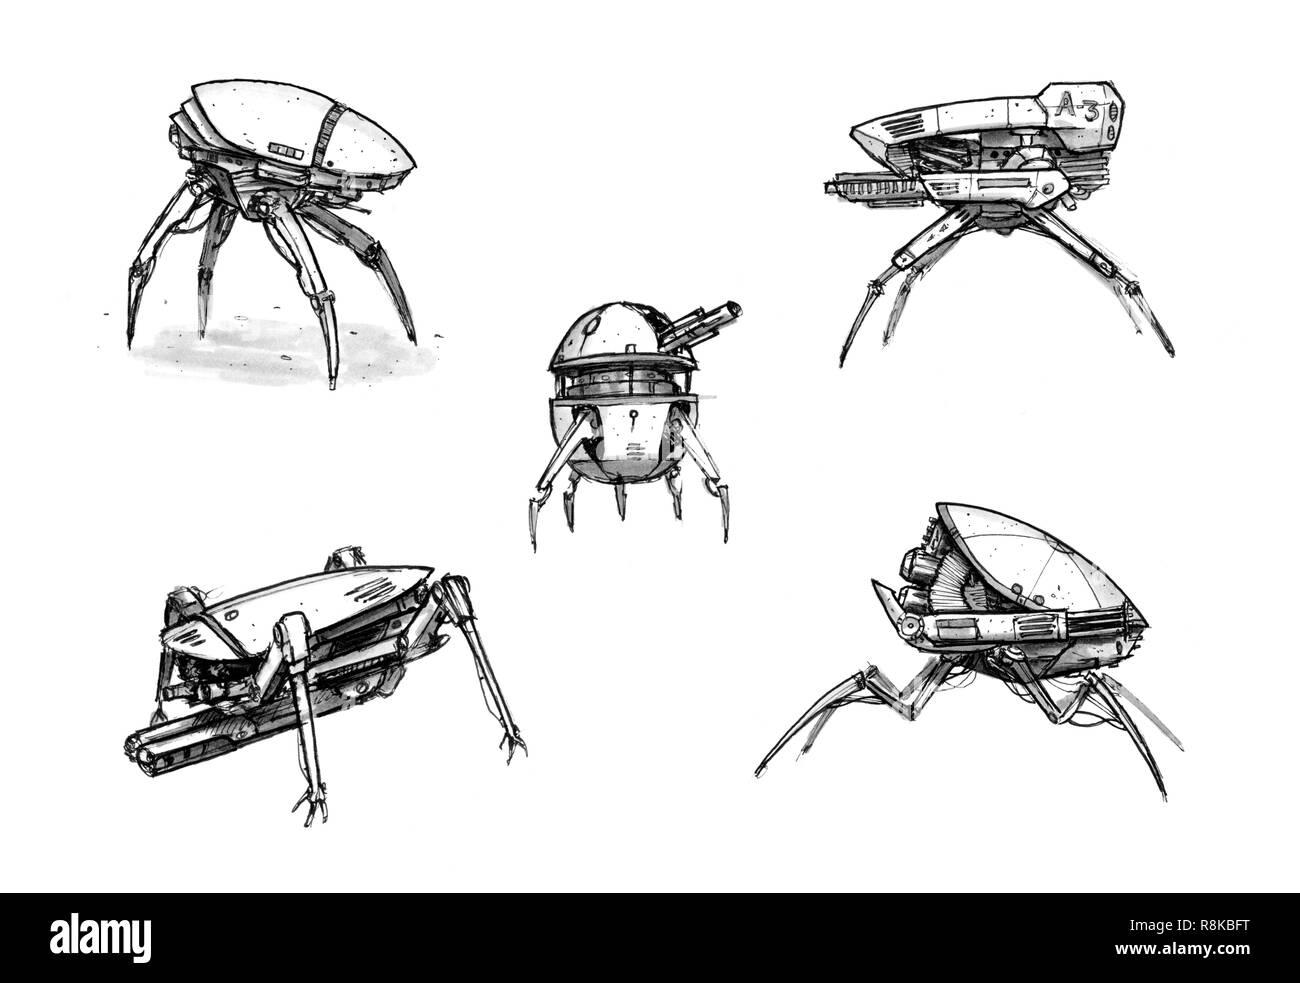 Sci Fi Futuristic Robot Concept Art